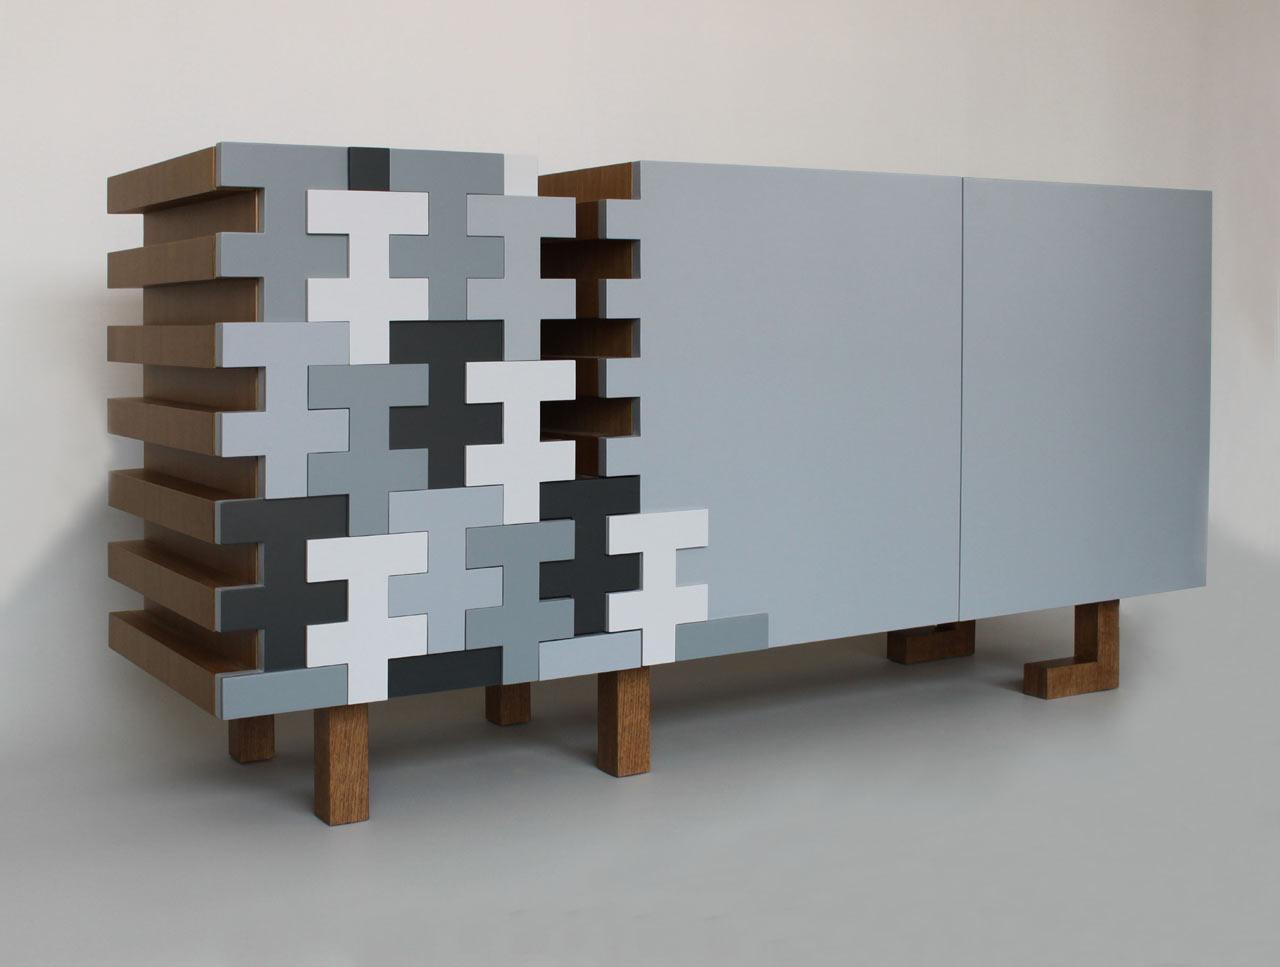 Taree Sideboard by Terezie Simonova for E1+E4